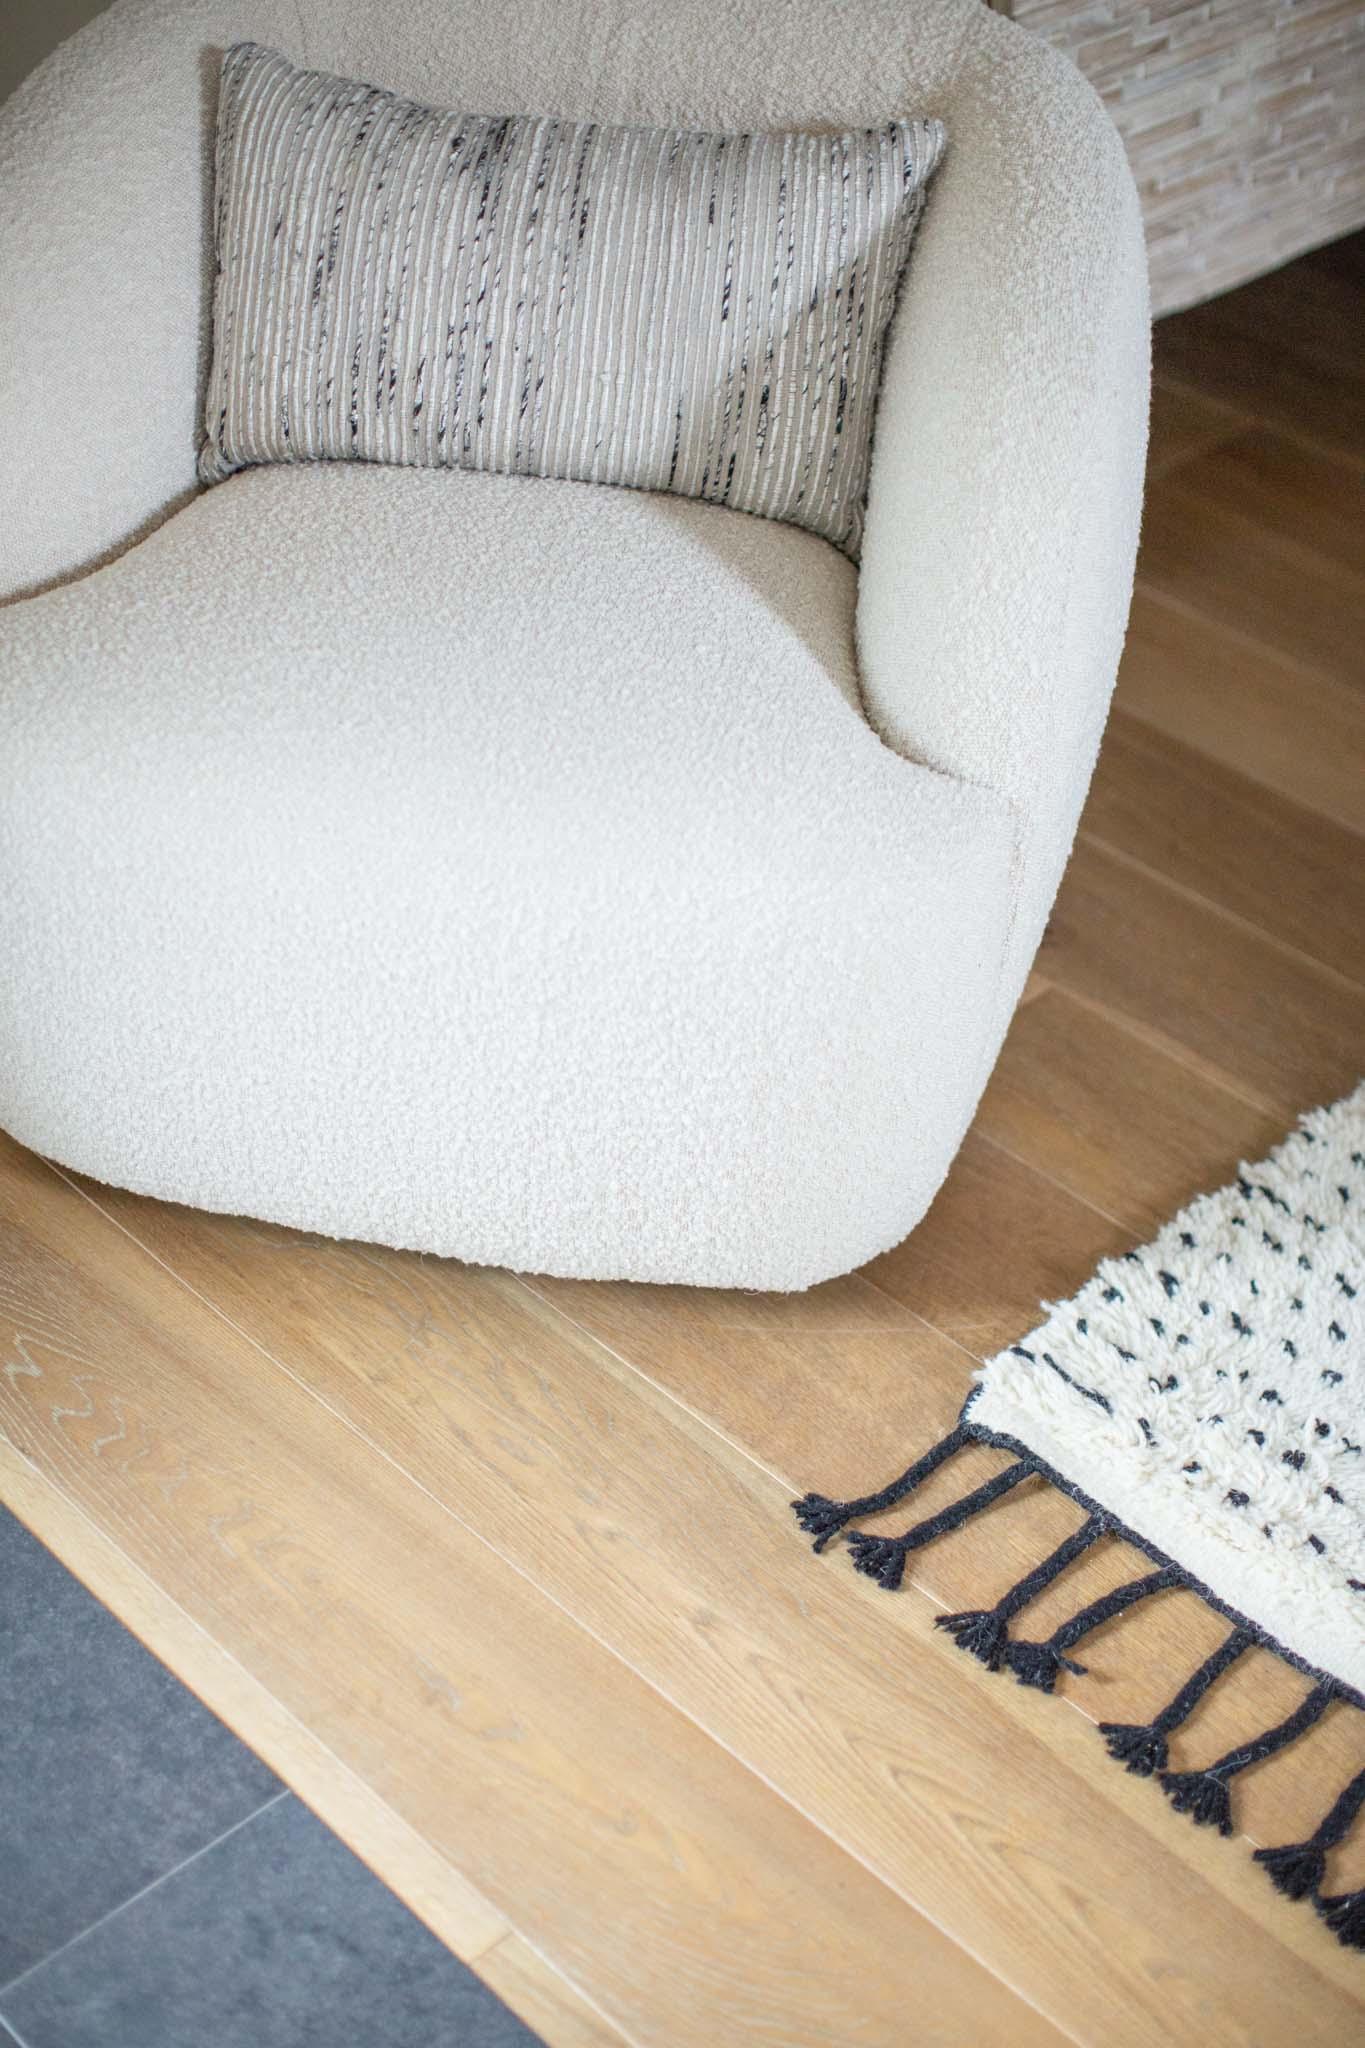 Jodi G Designs | Santa Barbara Interior Design Lanscape -41.jpg